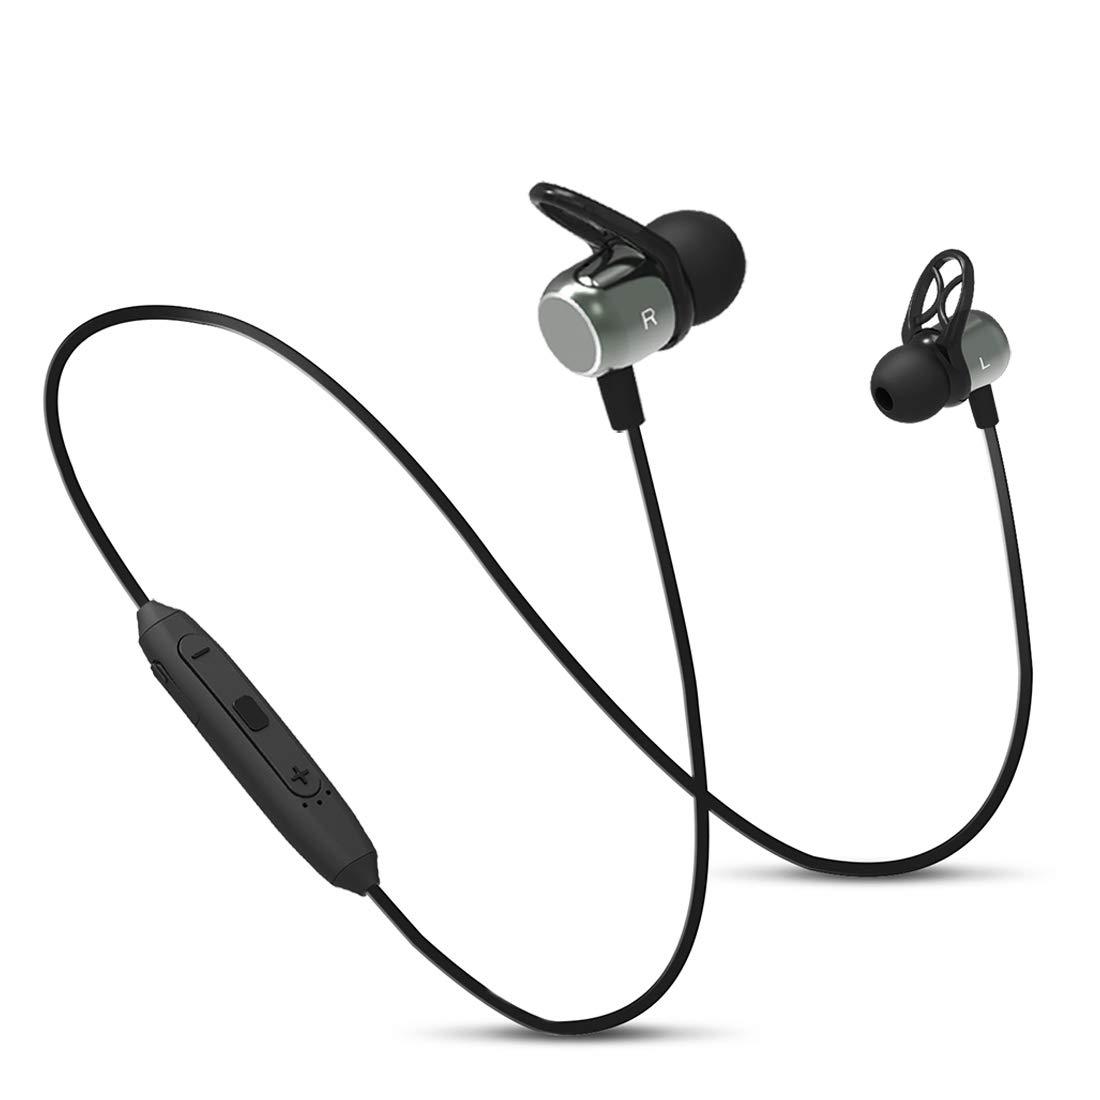 Ptron Intunes Evo Bluetooth 5.0 In-Ear Sport Bluetooth